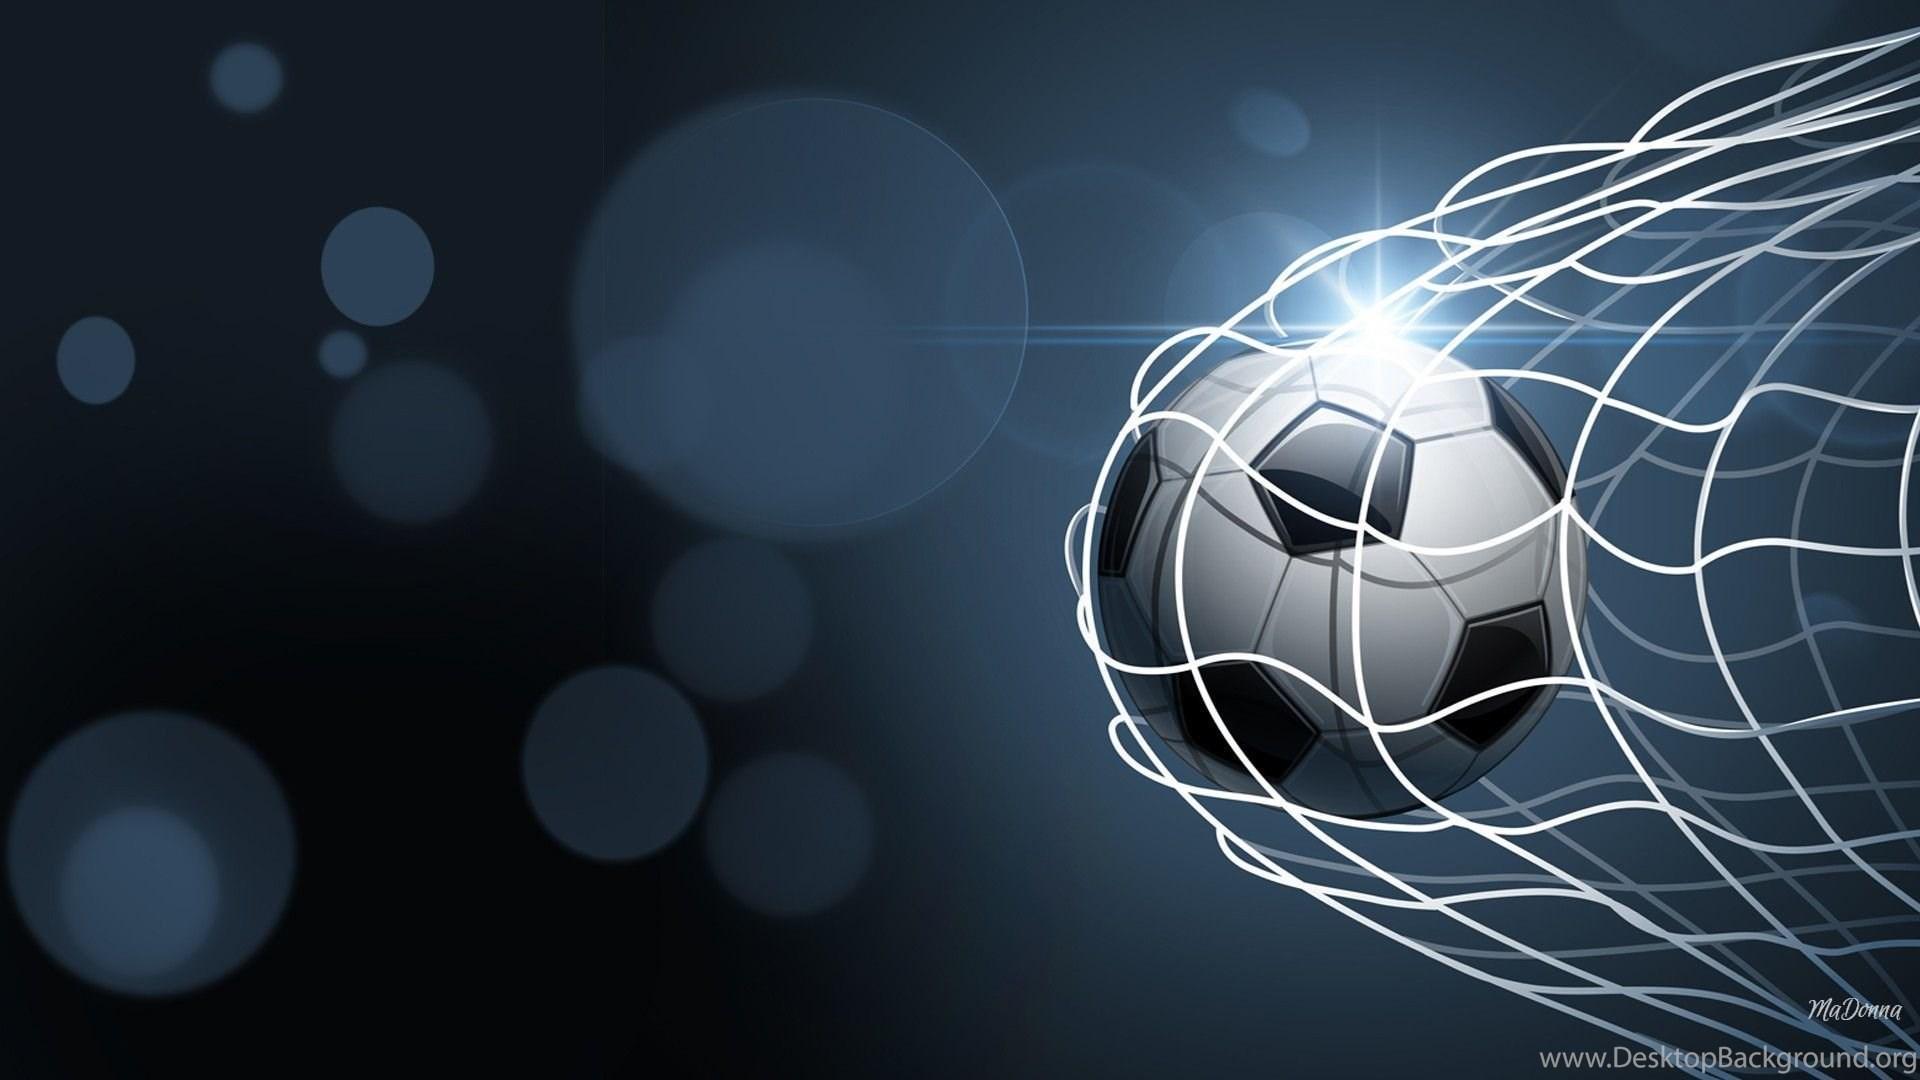 Sports Backgrounds Pics: Top Soccer Goal Net With Images For Pinterest Desktop